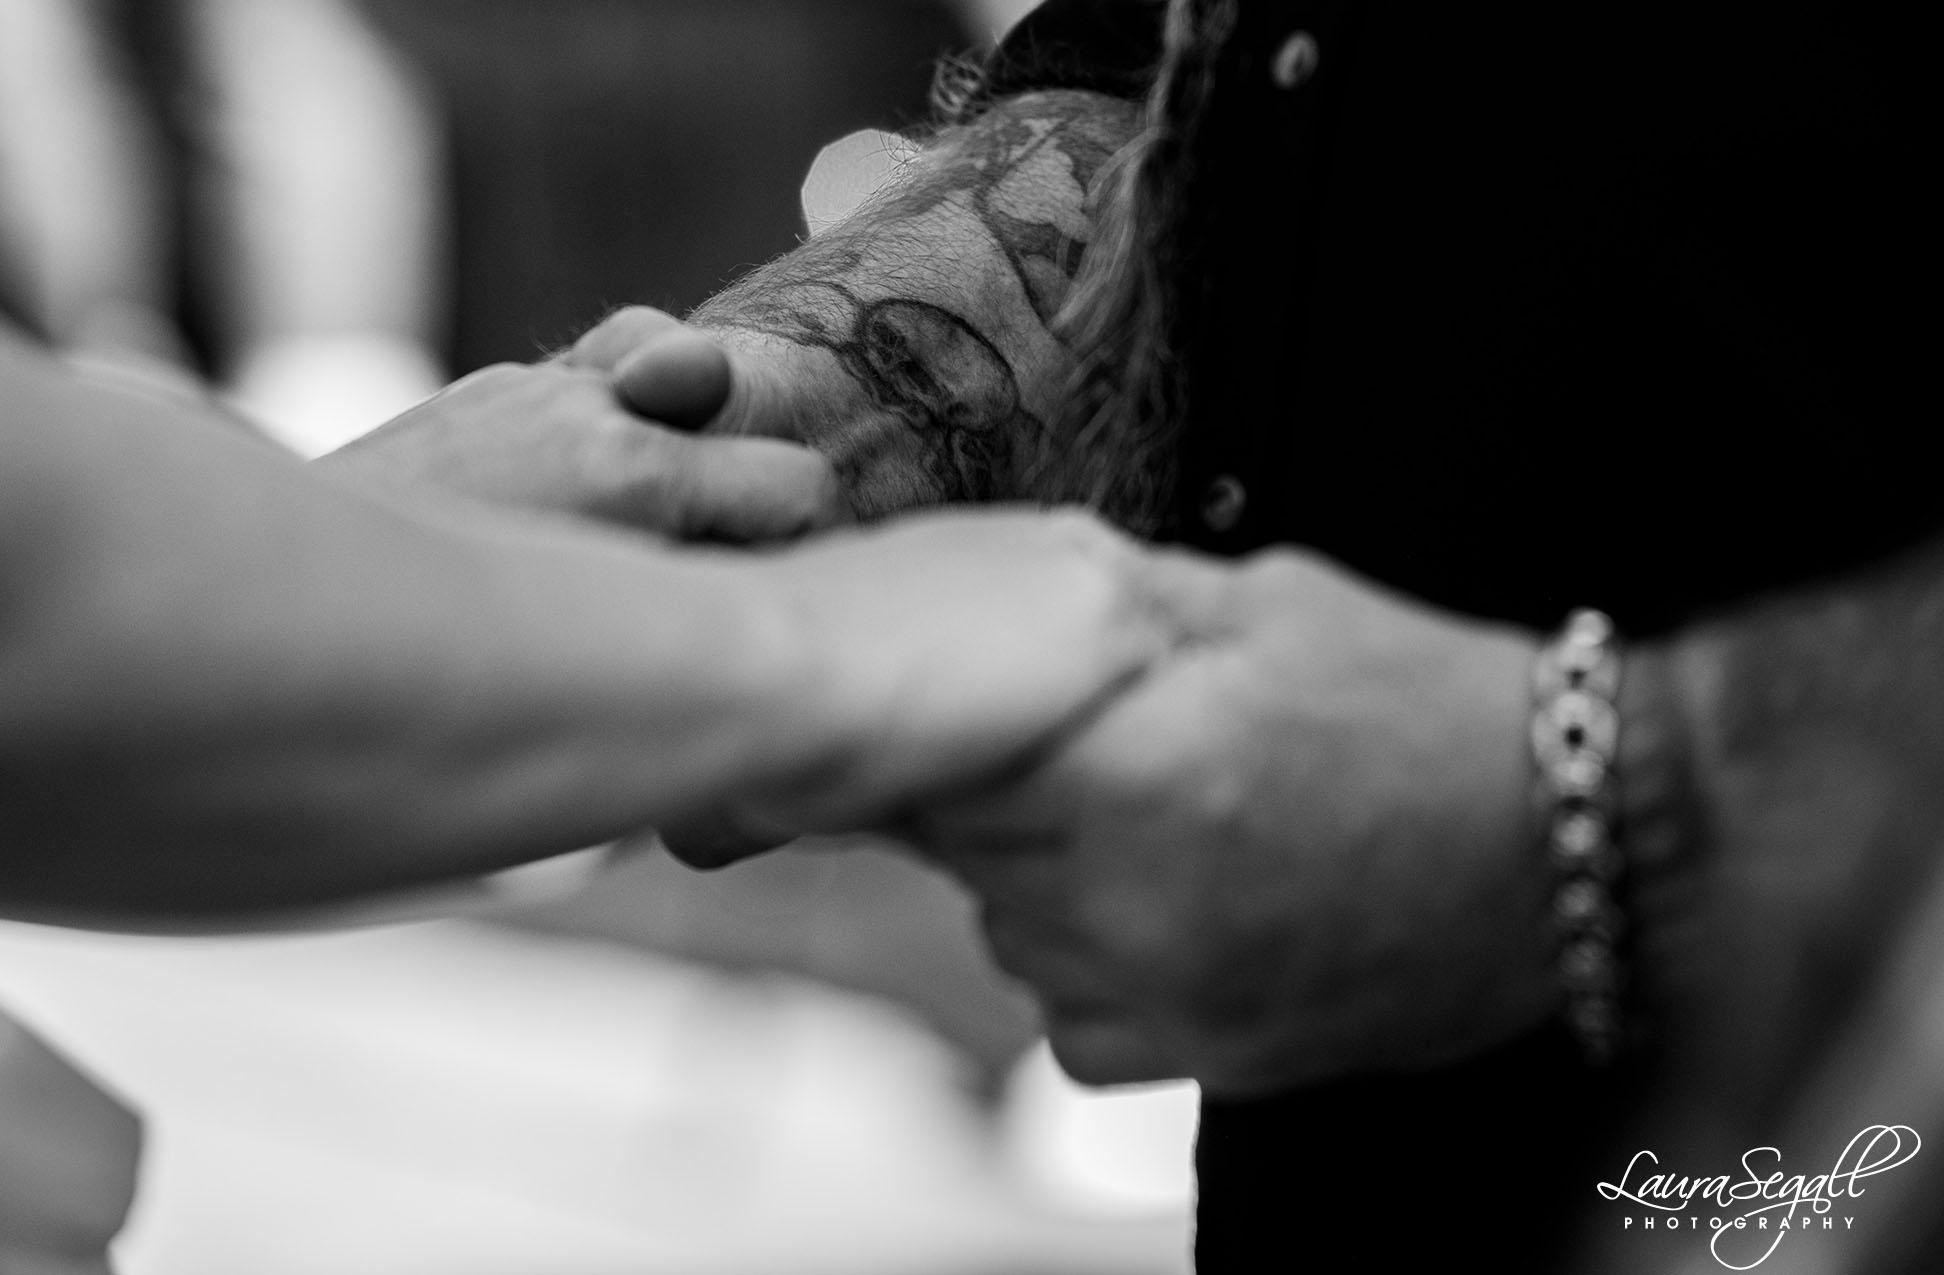 details hands